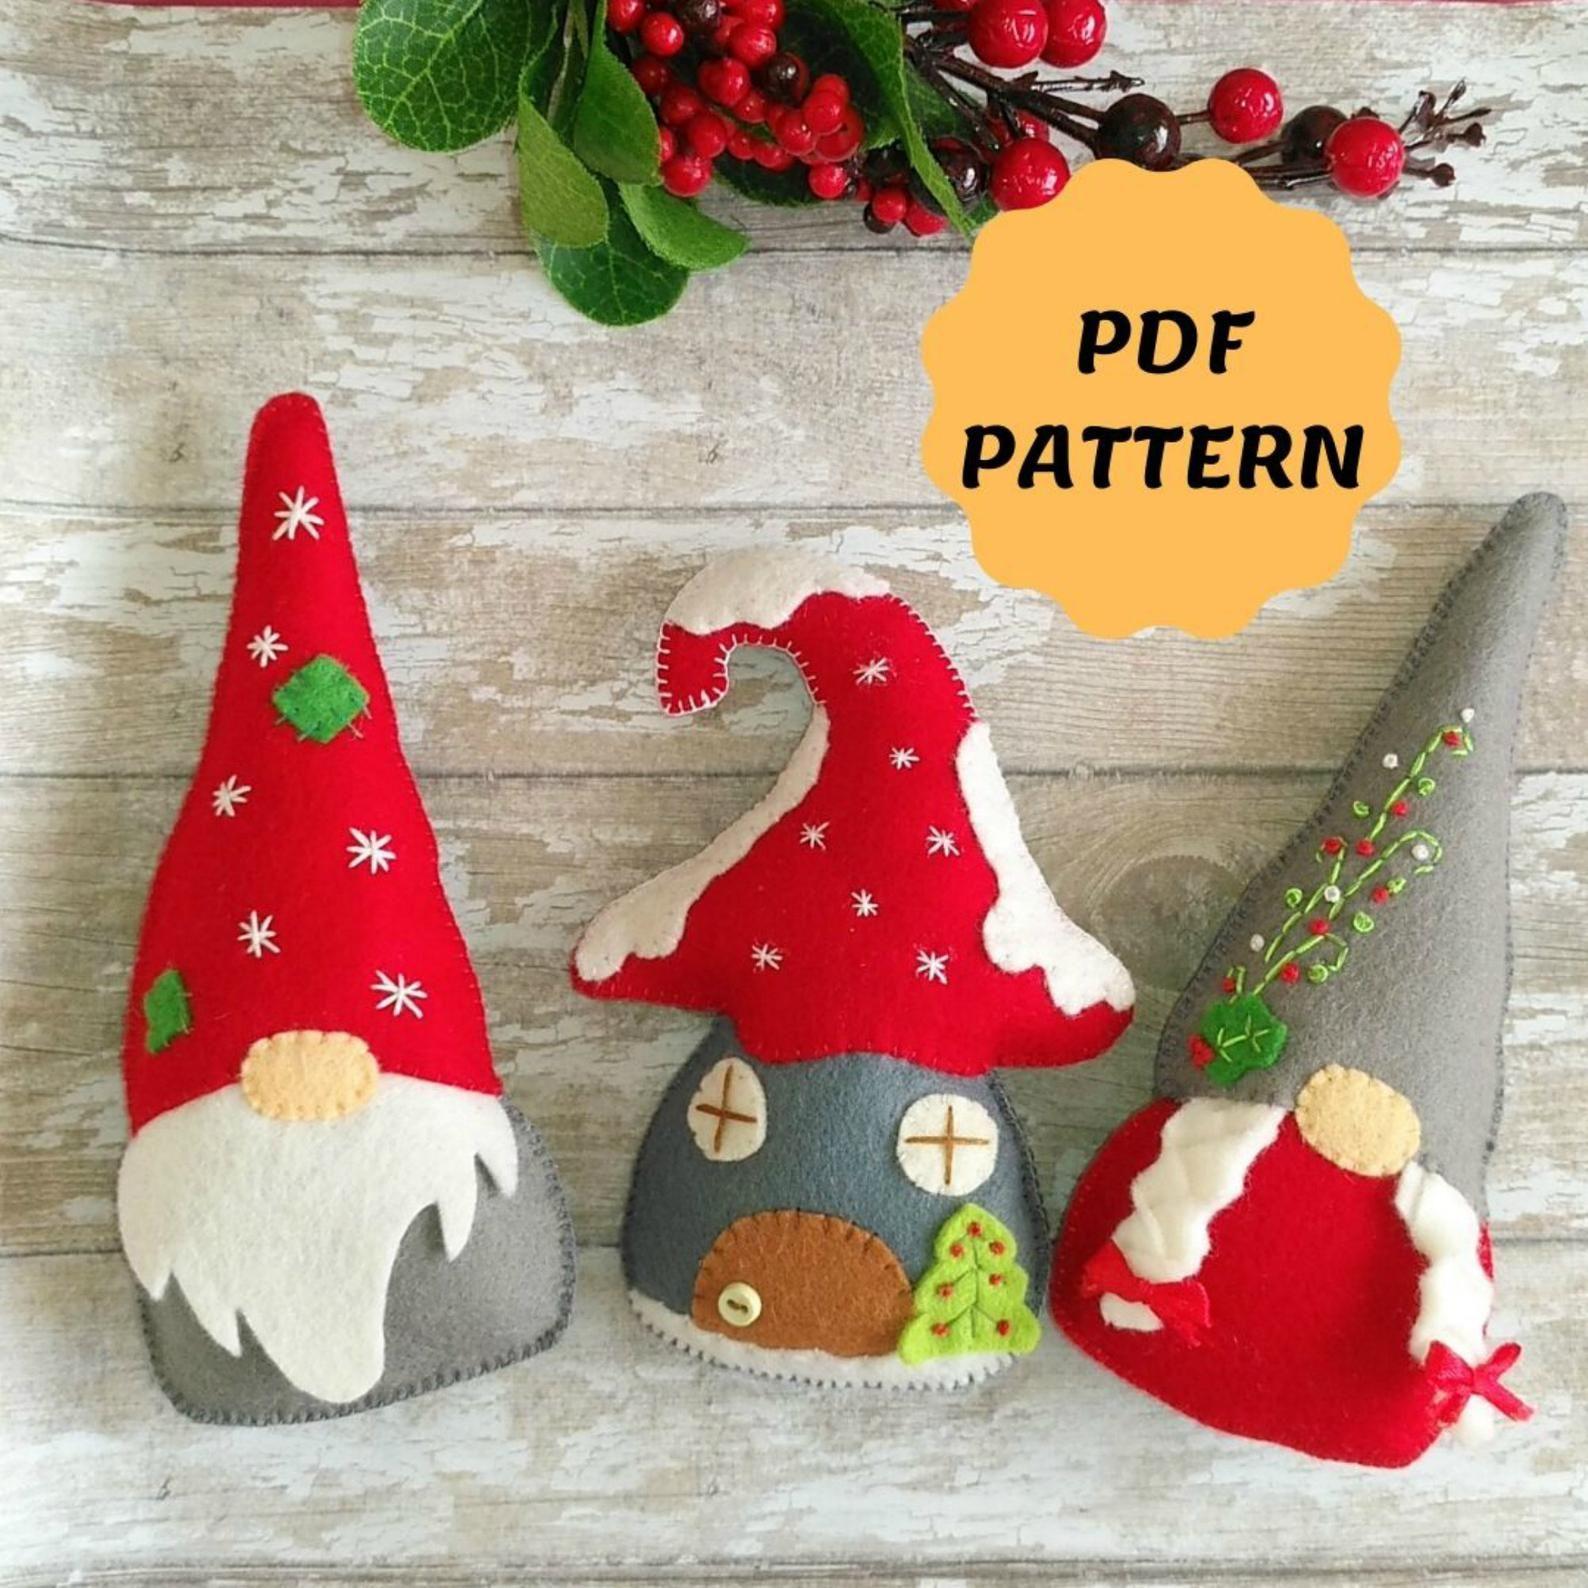 Felt Gnome Ornament Pattern Felt Christmas Ornaments Tomte Etsy Diy Felt Christmas Ornaments Sewn Christmas Ornaments Felt Christmas Ornaments